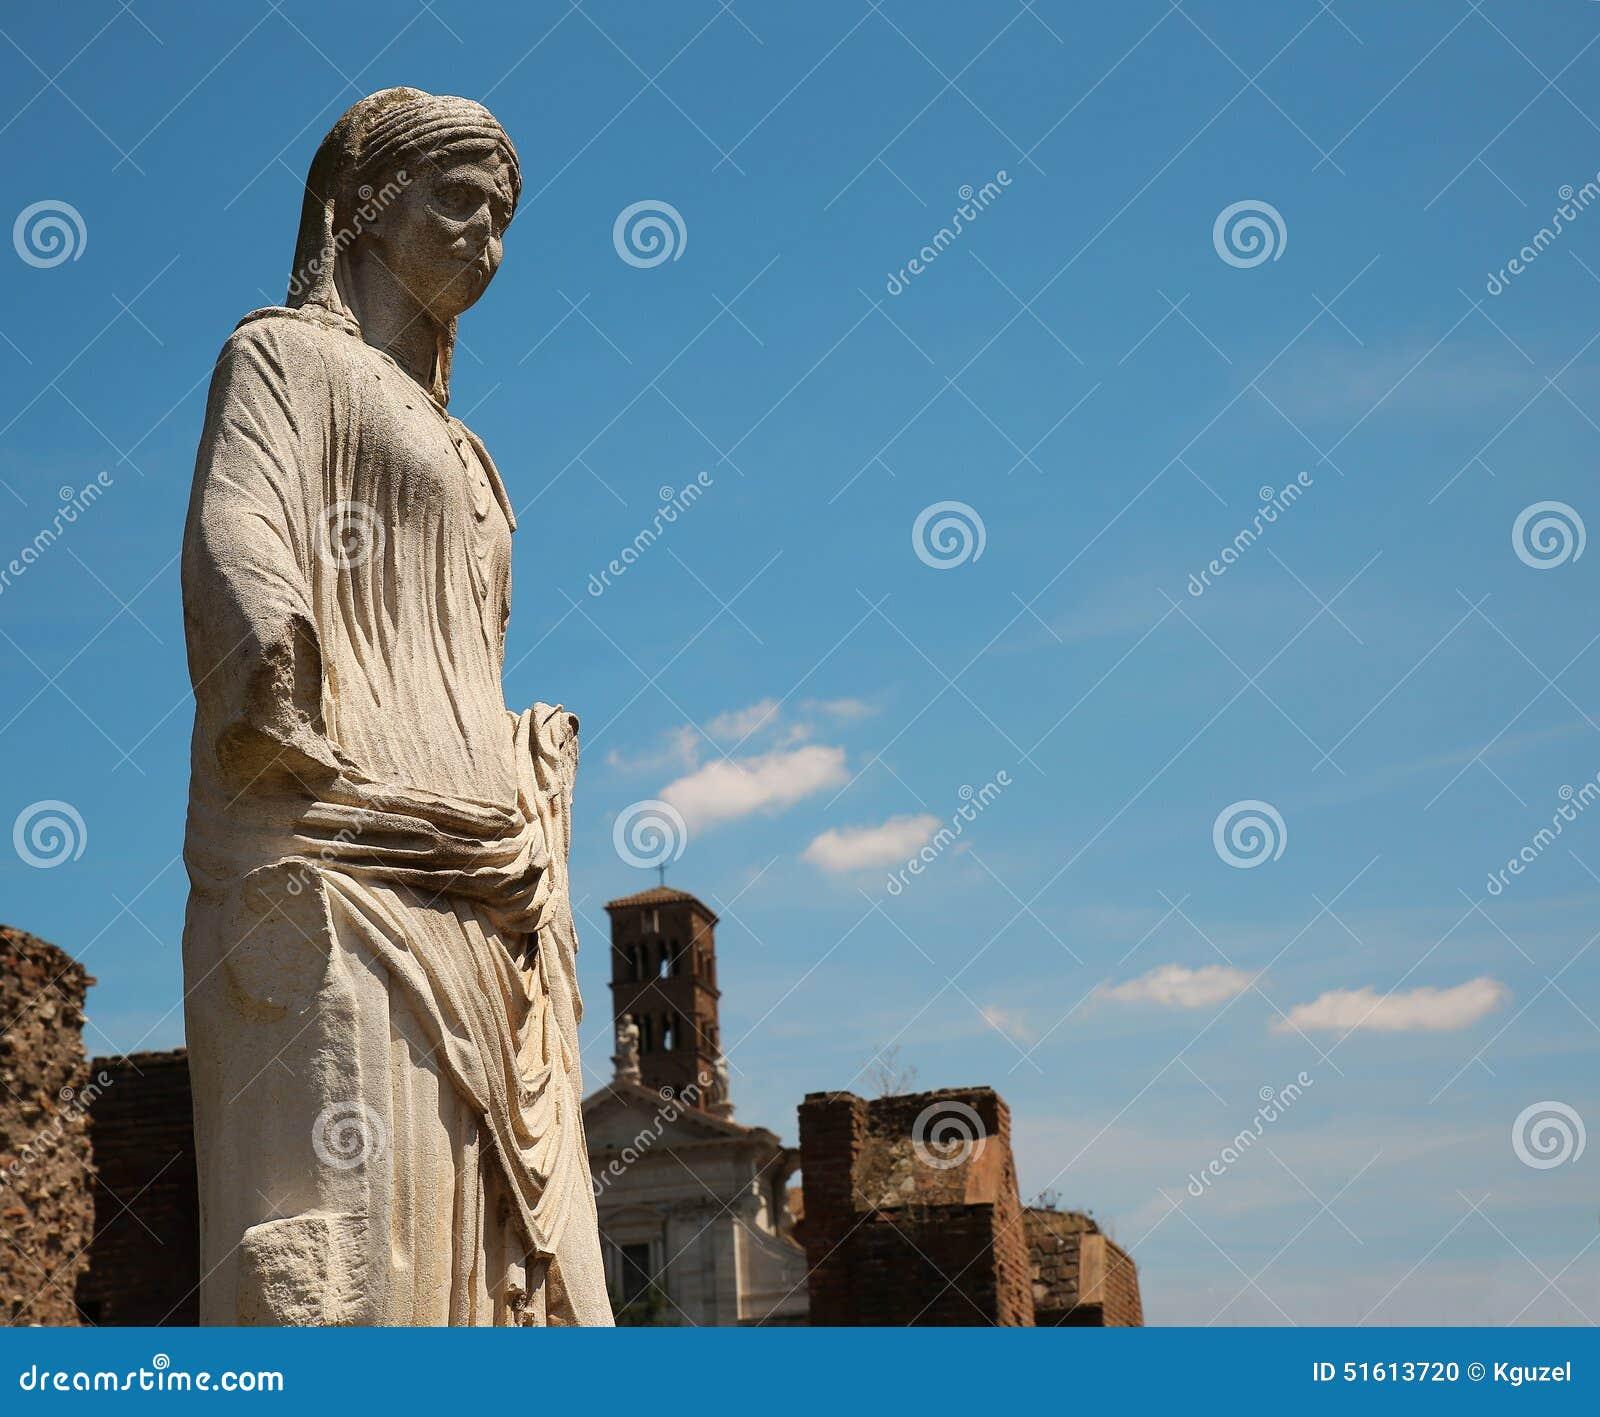 Marmorstaty av en kvinna i Rome, Italien